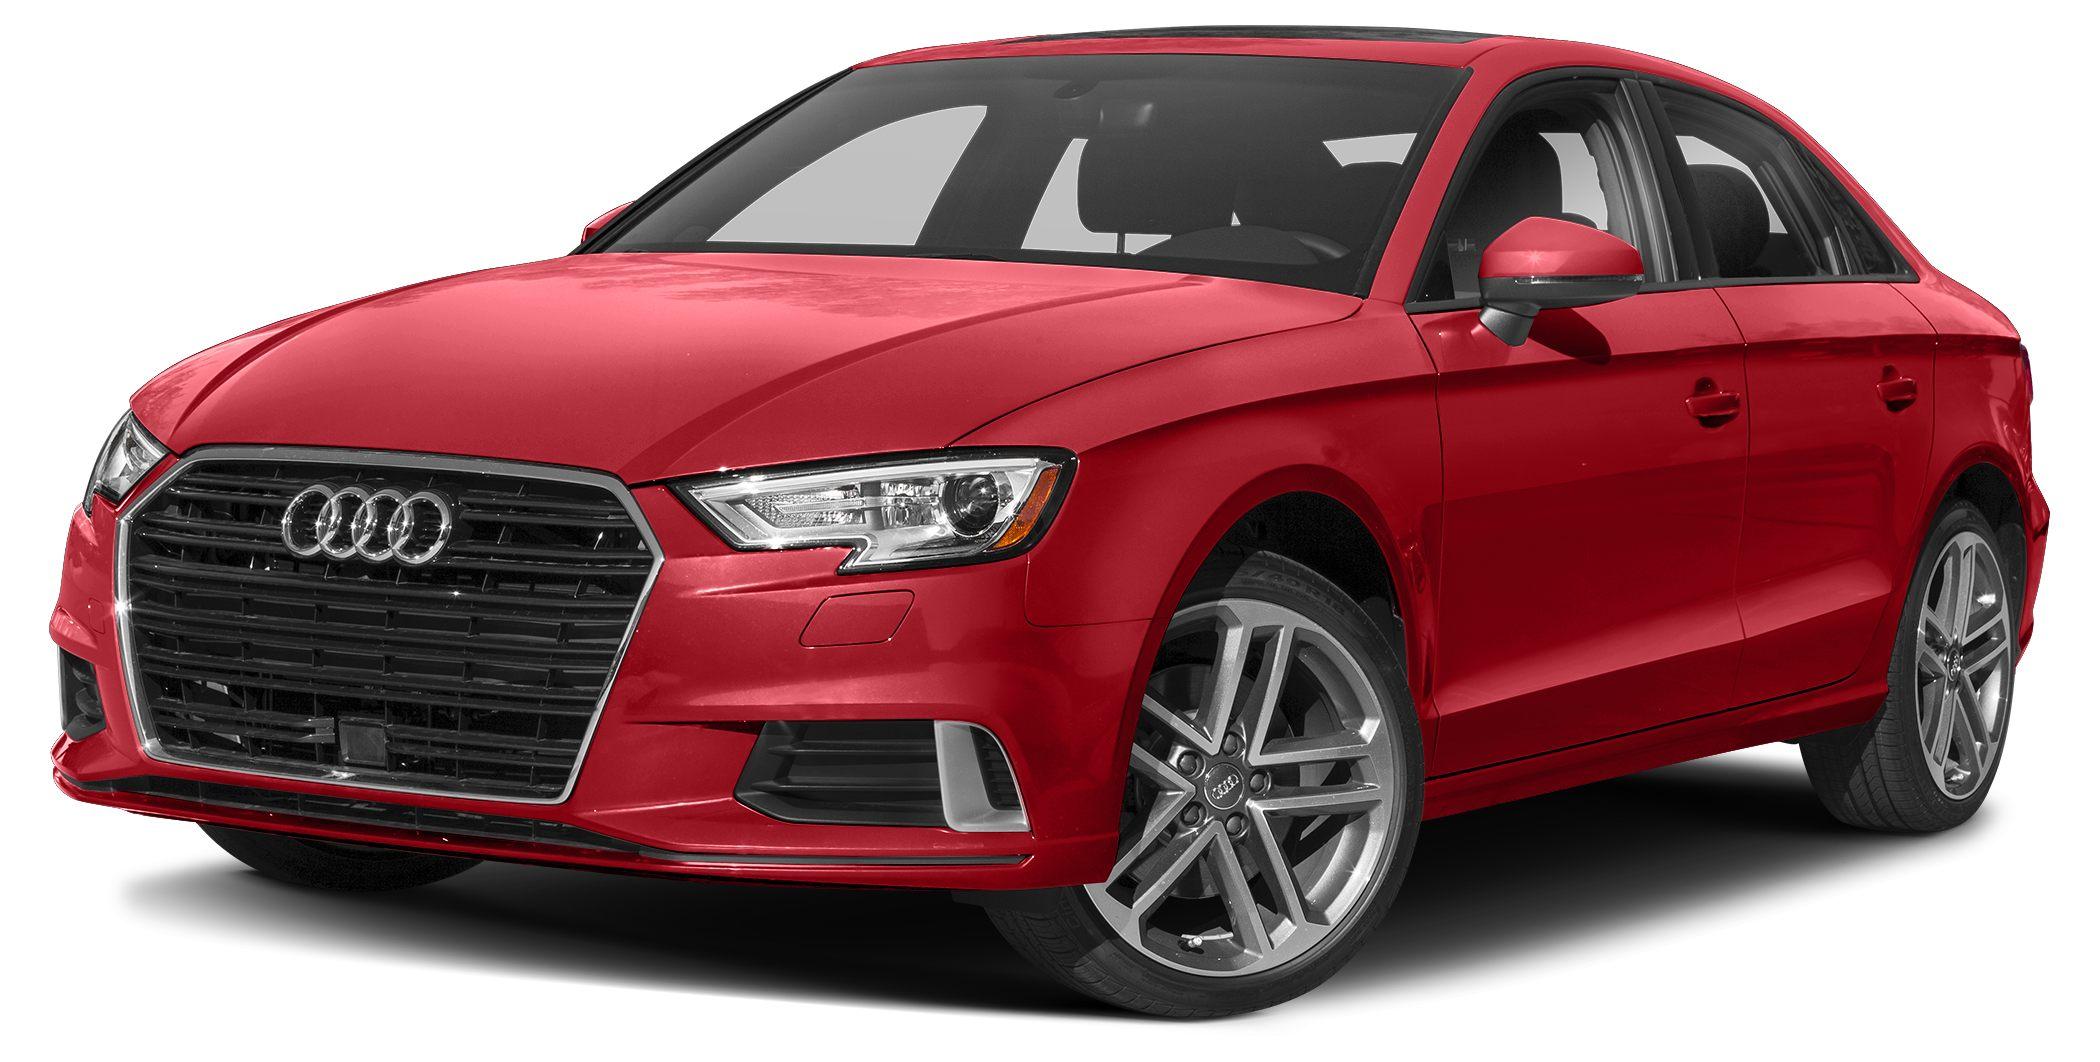 2018 Audi A3 20T quattro Premium Audi CertifiedThis All Wheel Drive Very Low Mileage A3 Premiu